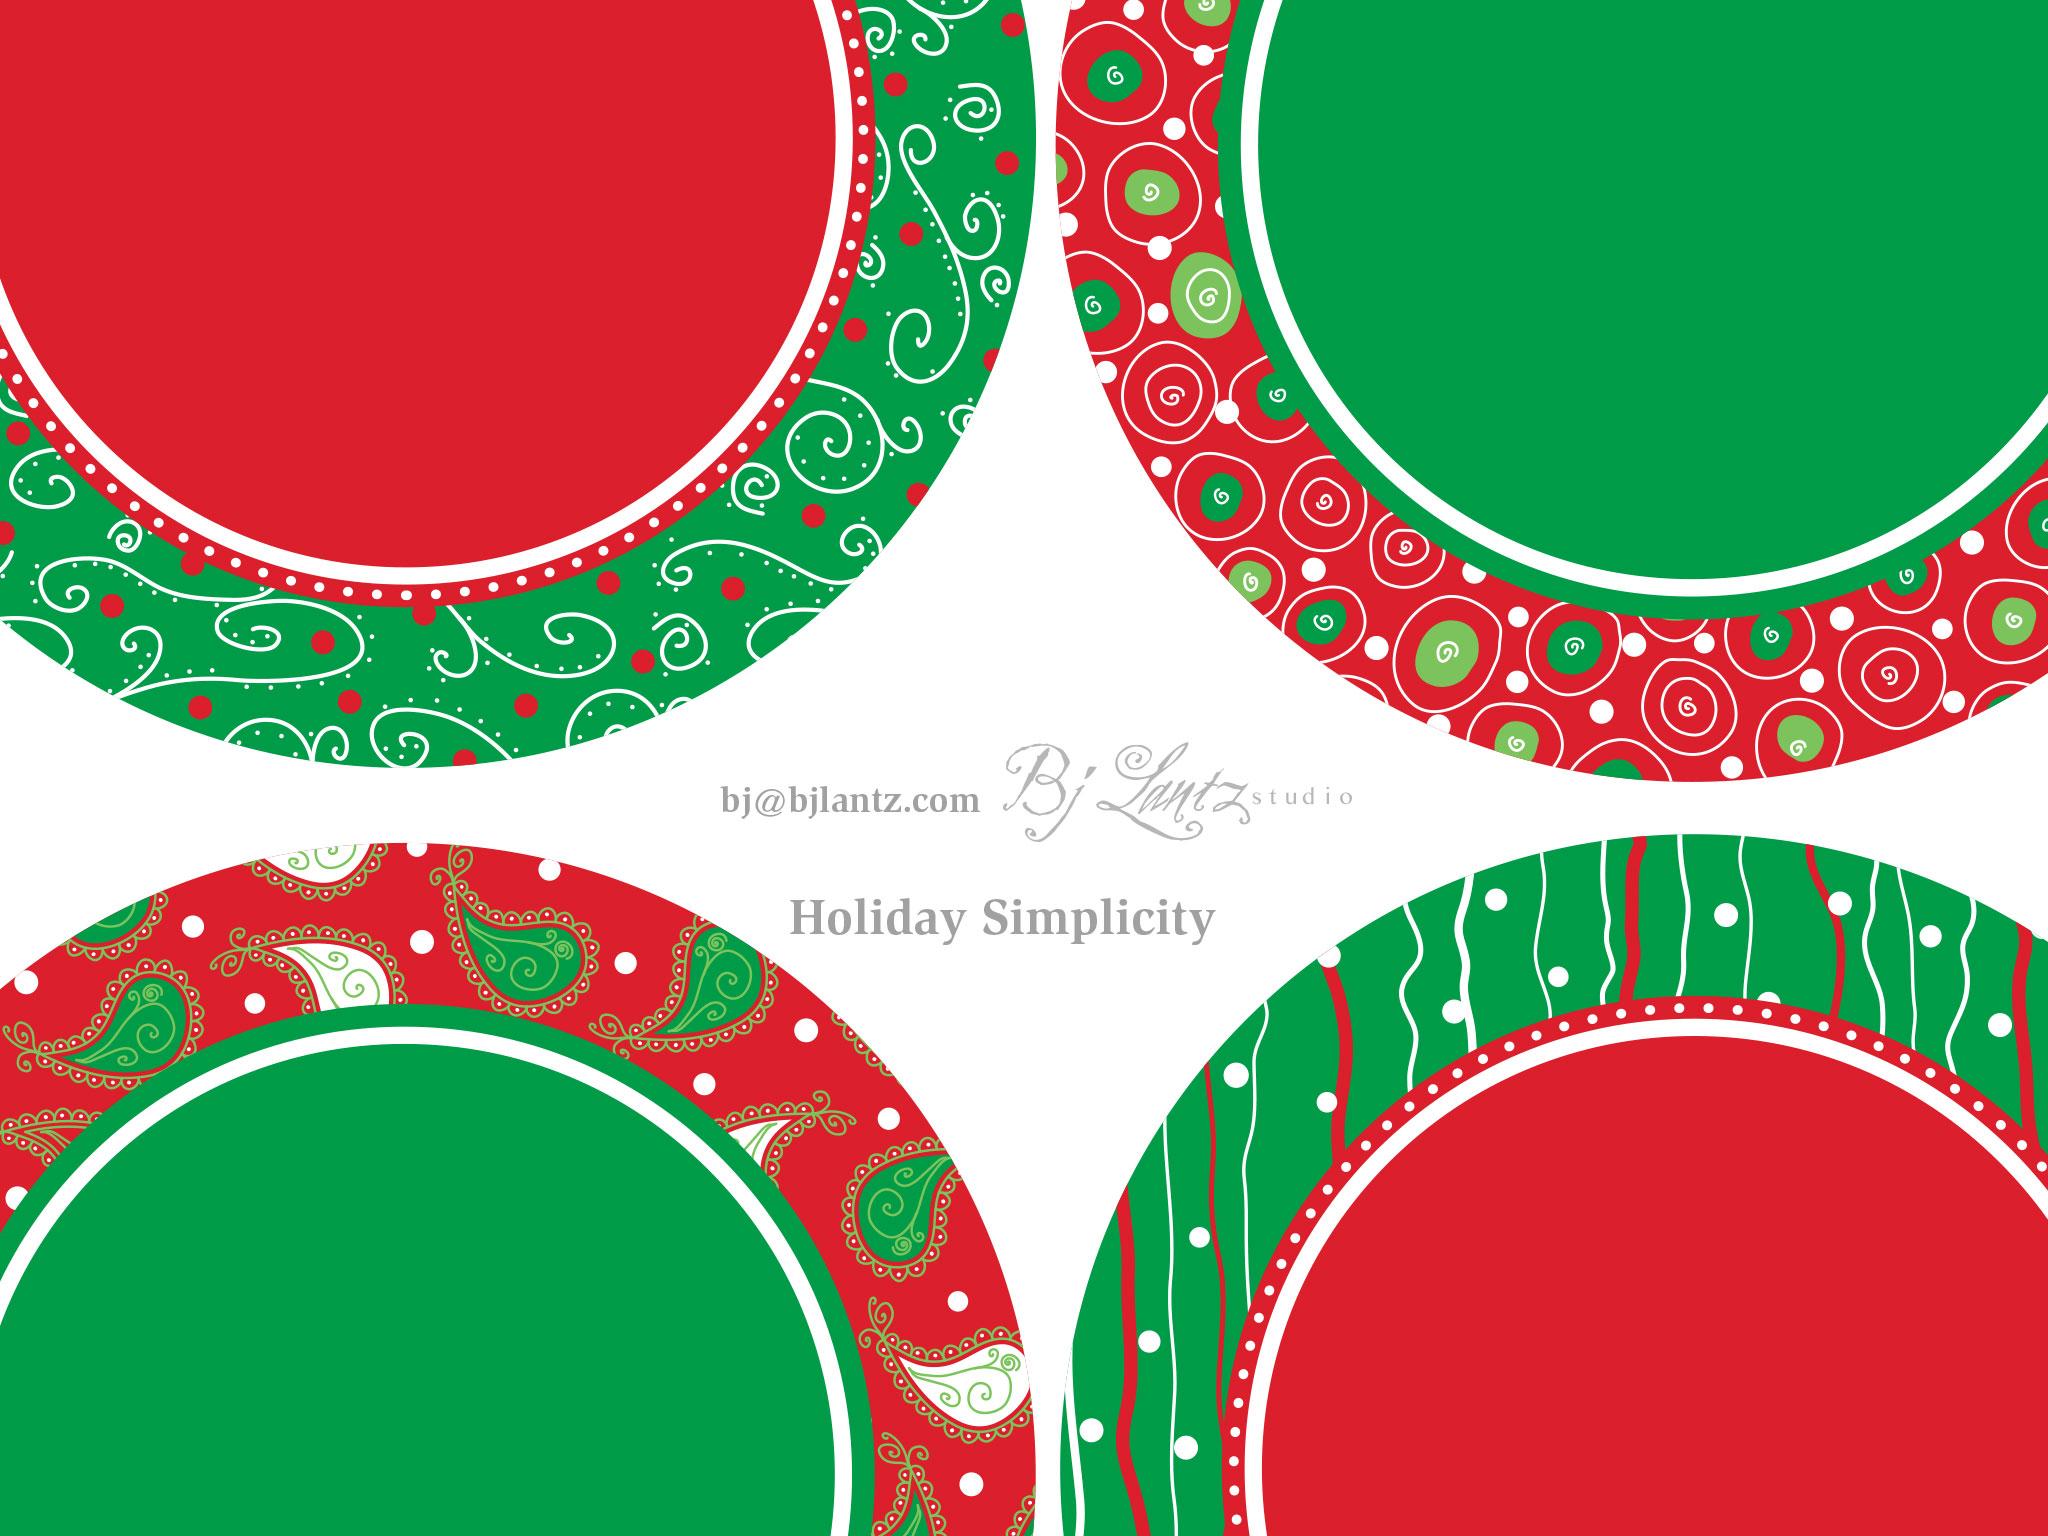 HolidaySimplicity_portfolio_1.jpg